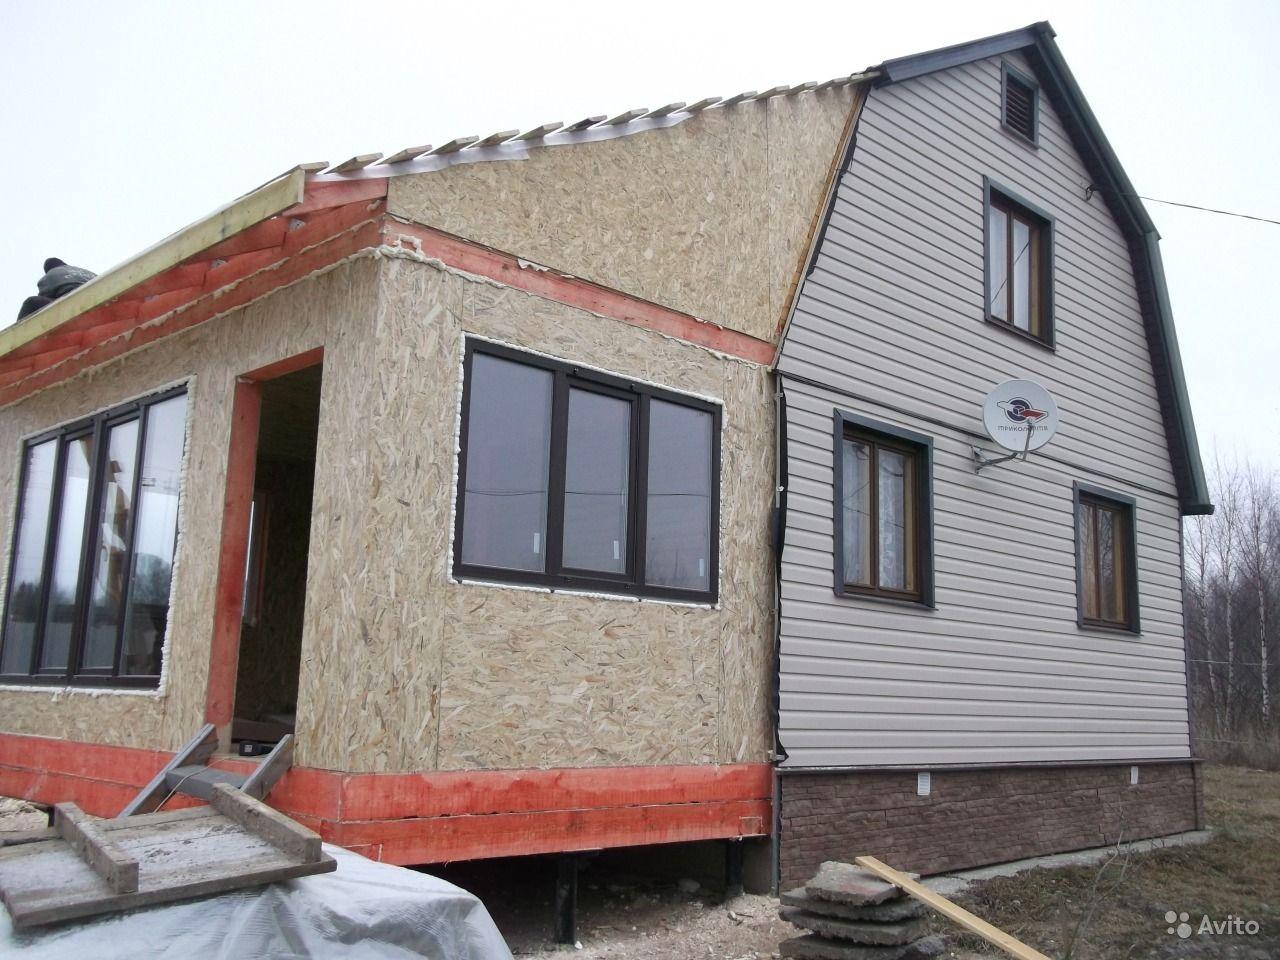 Фото пристройки к дому из осб